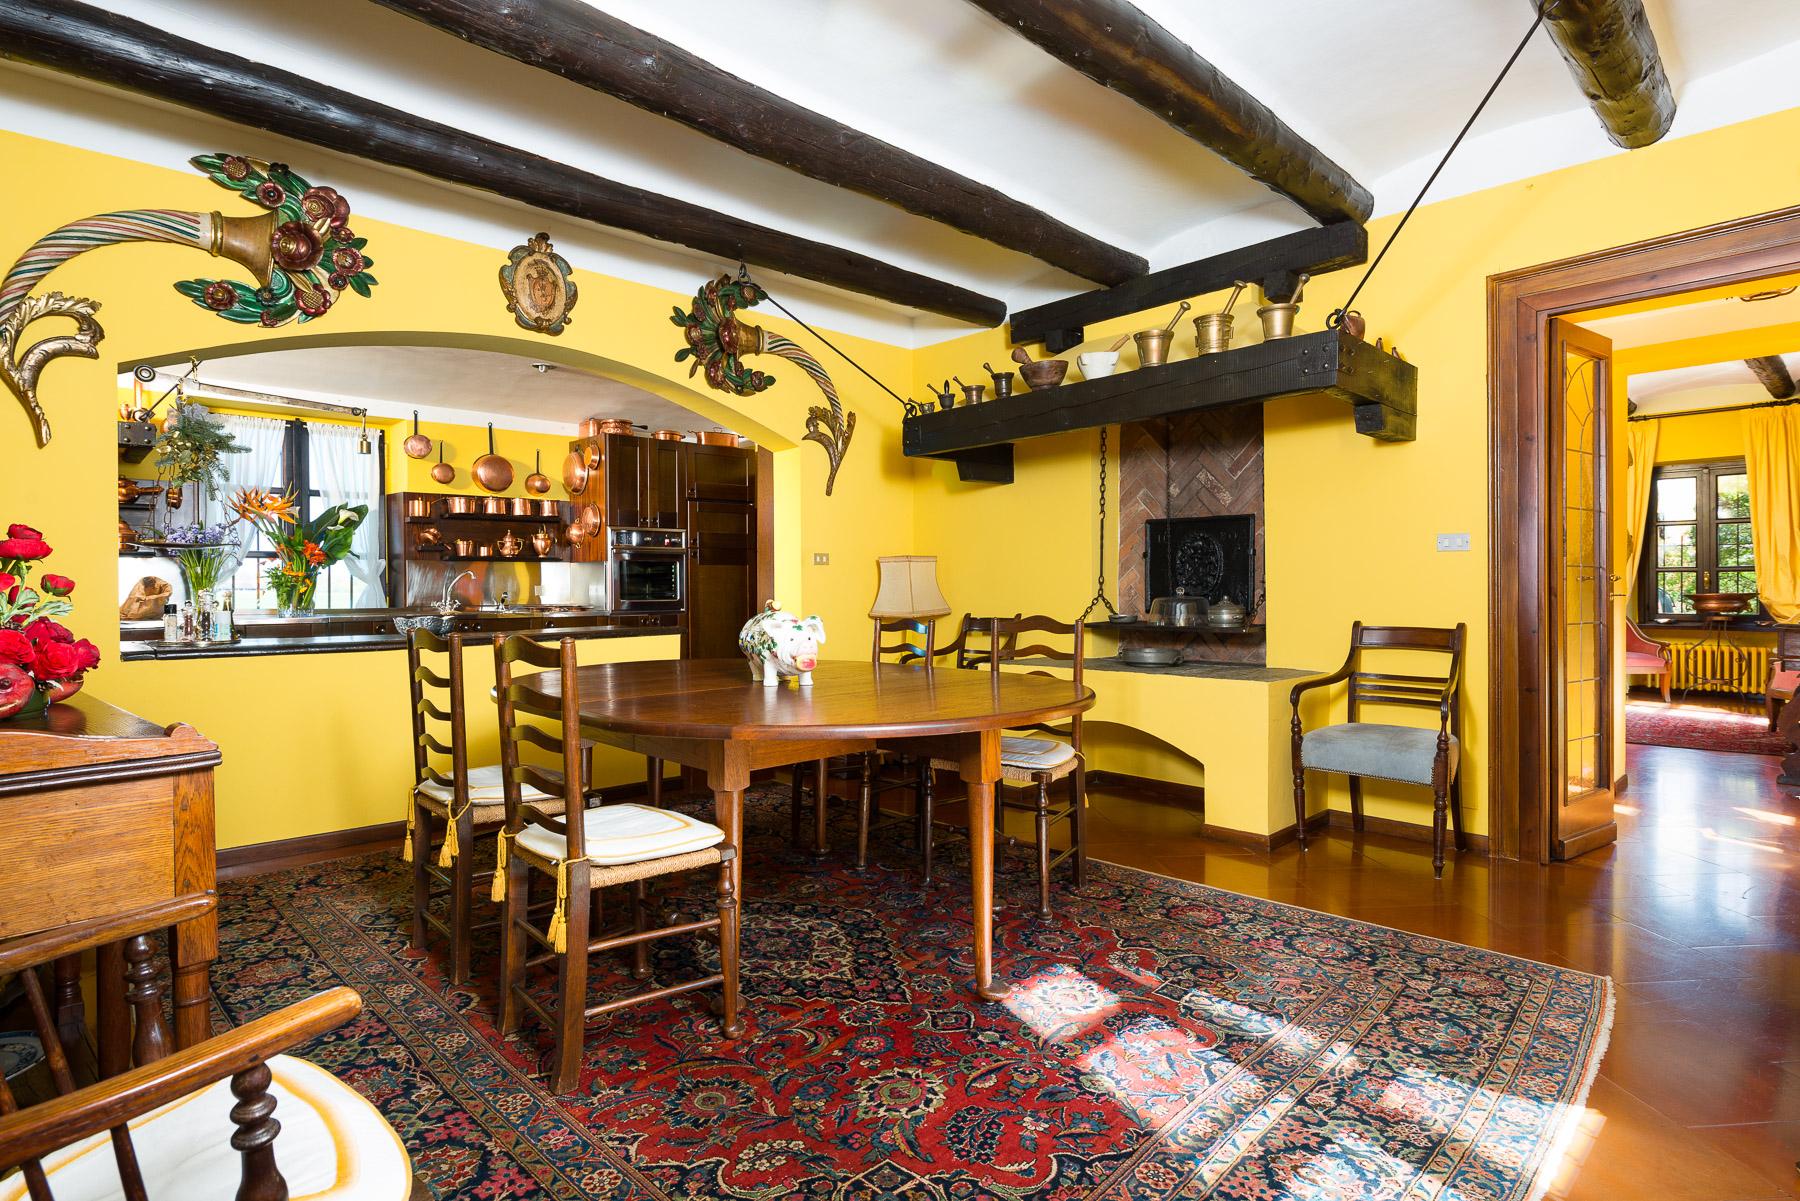 Casa indipendente in Vendita a Venaria: 5 locali, 500 mq - Foto 9